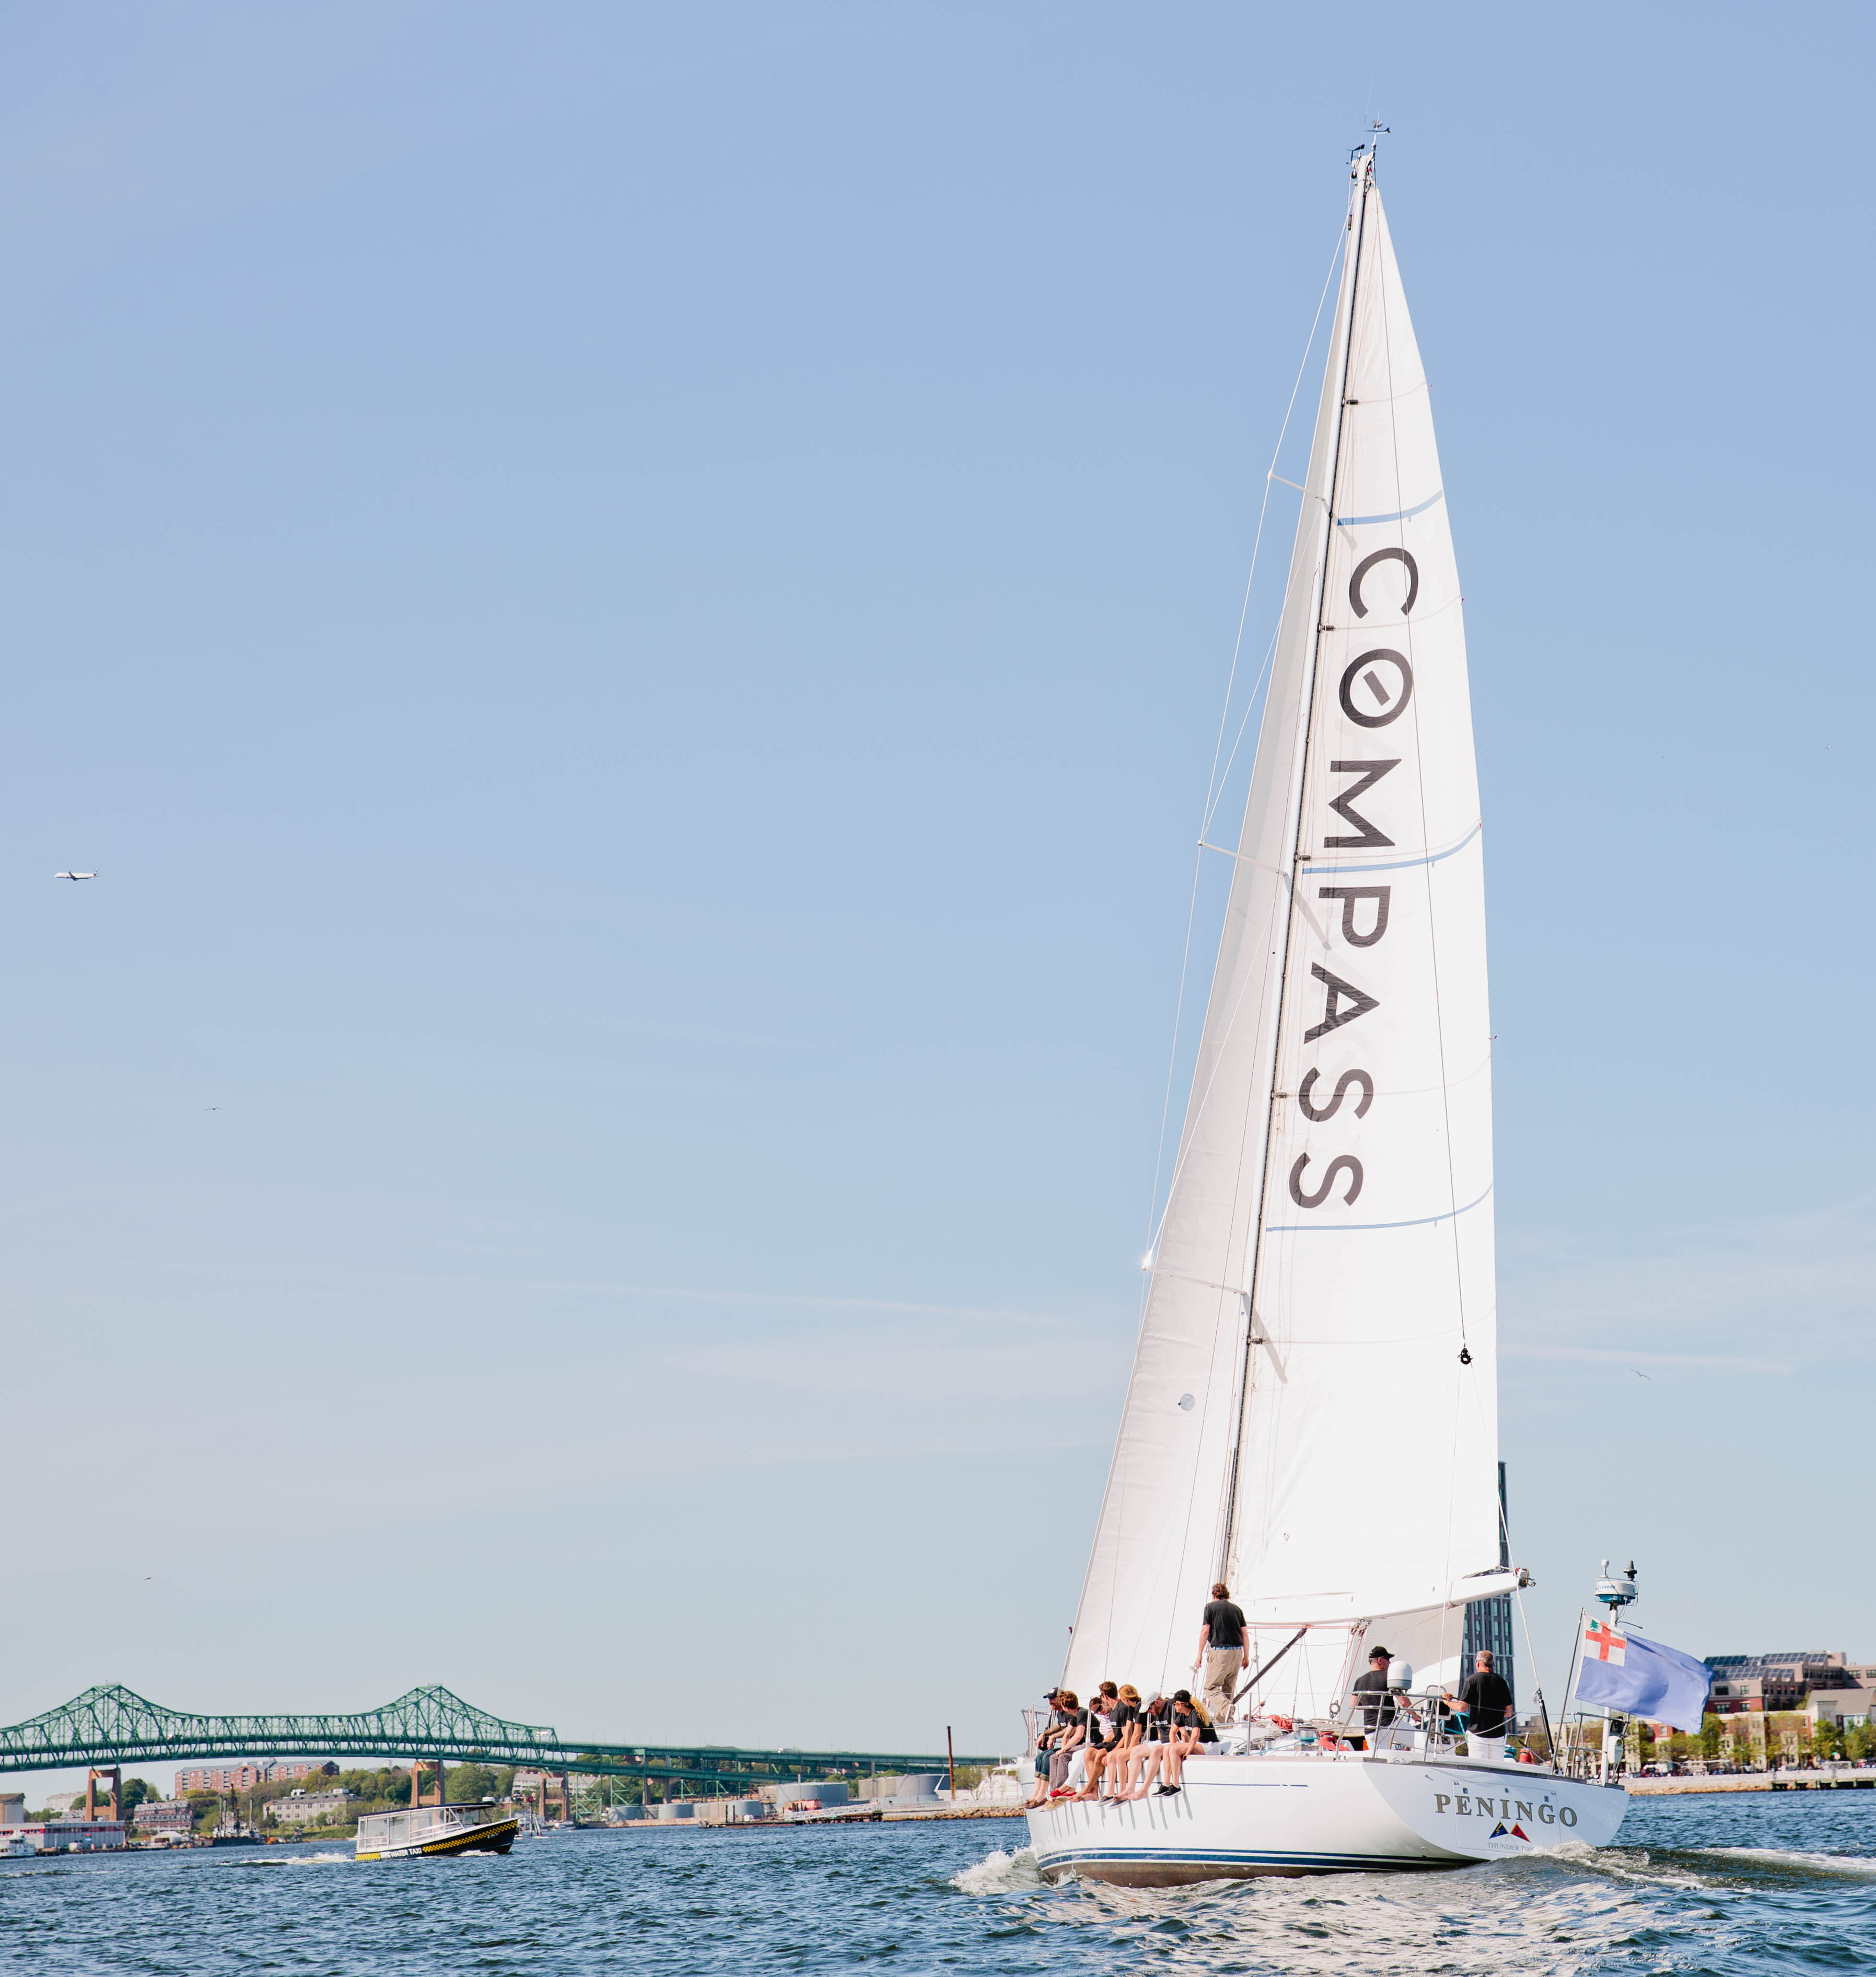 compas sailboat